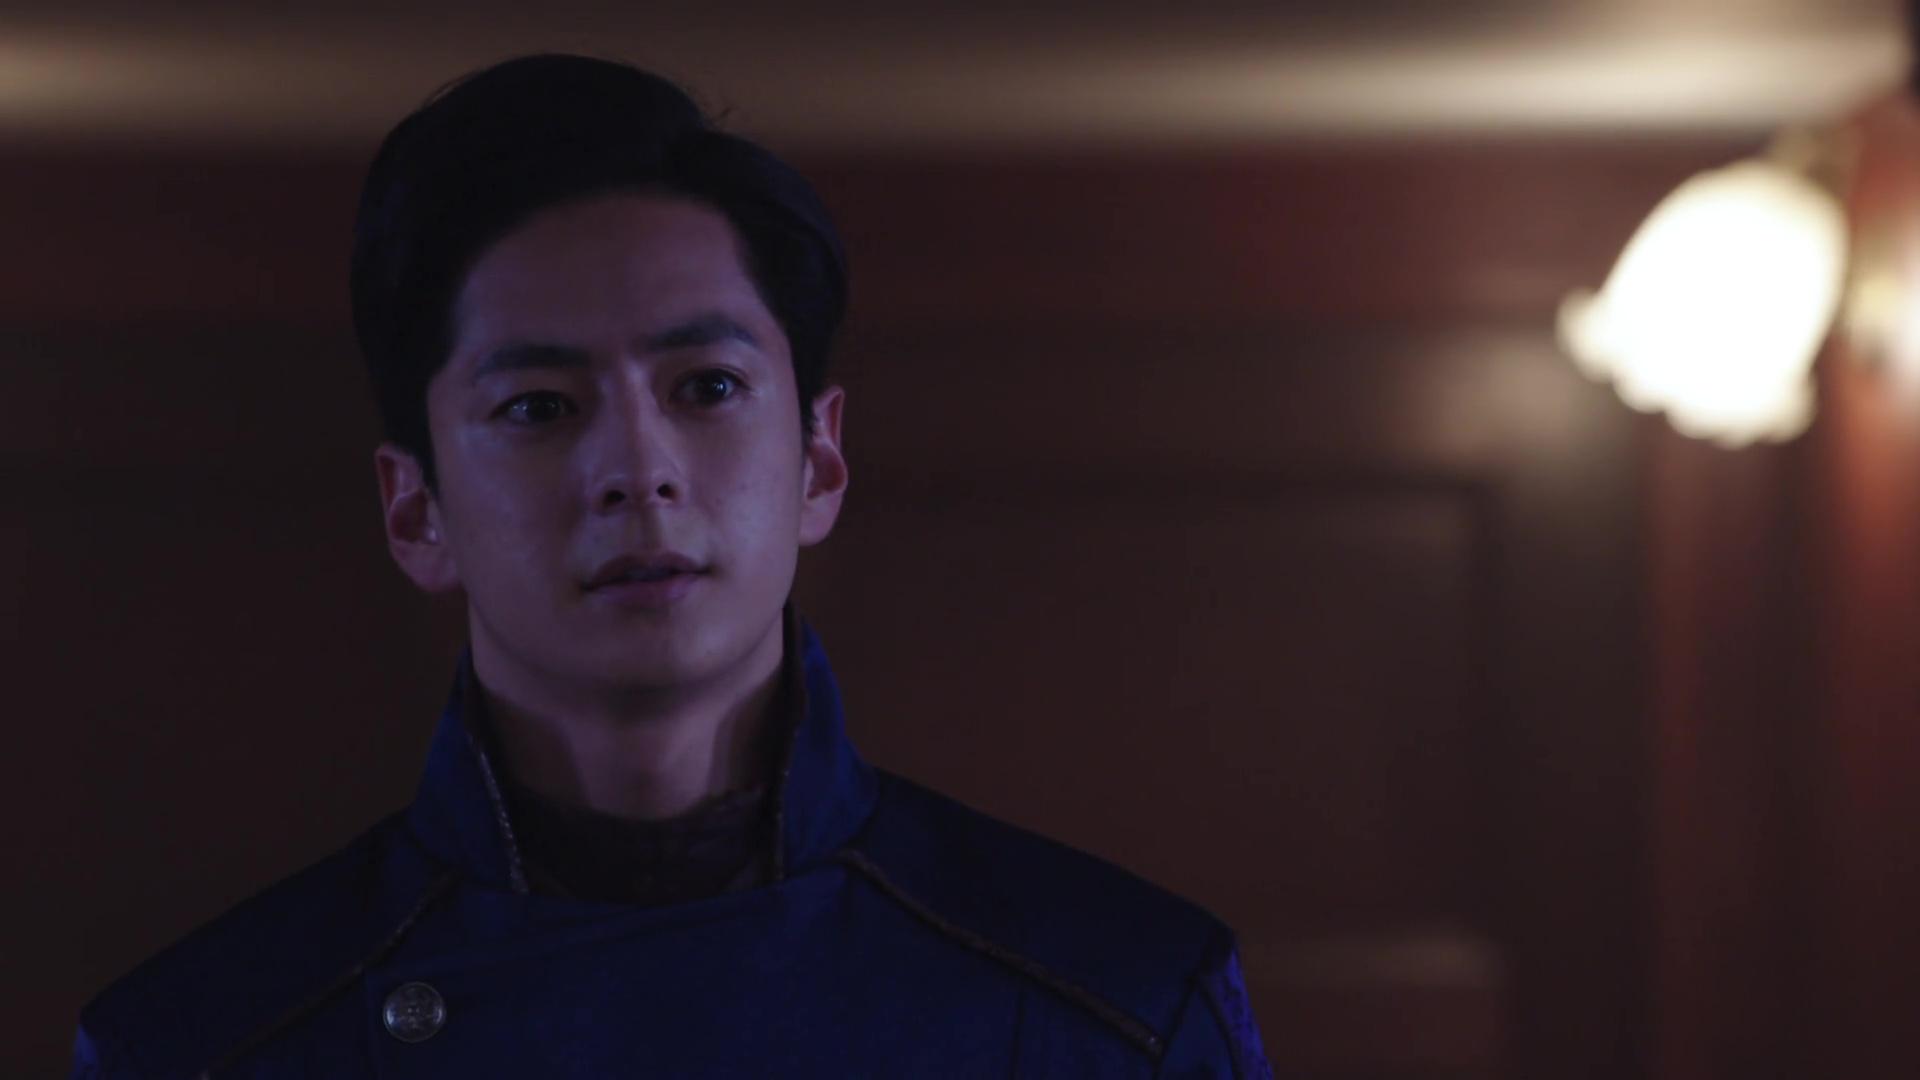 Kamen Rider Saber Episode 22 Recap